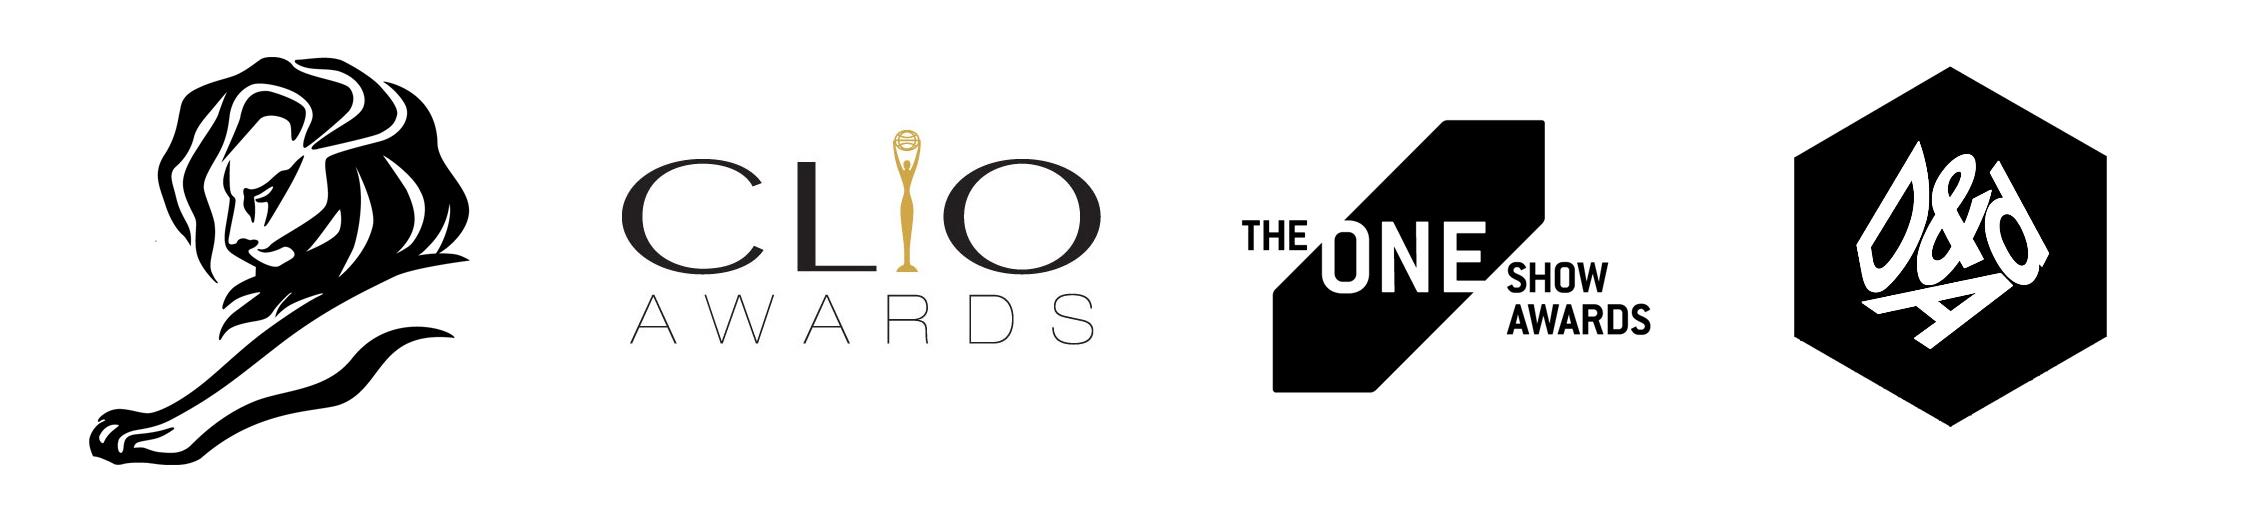 Technology-and-Stuff-Award-Logos.jpg